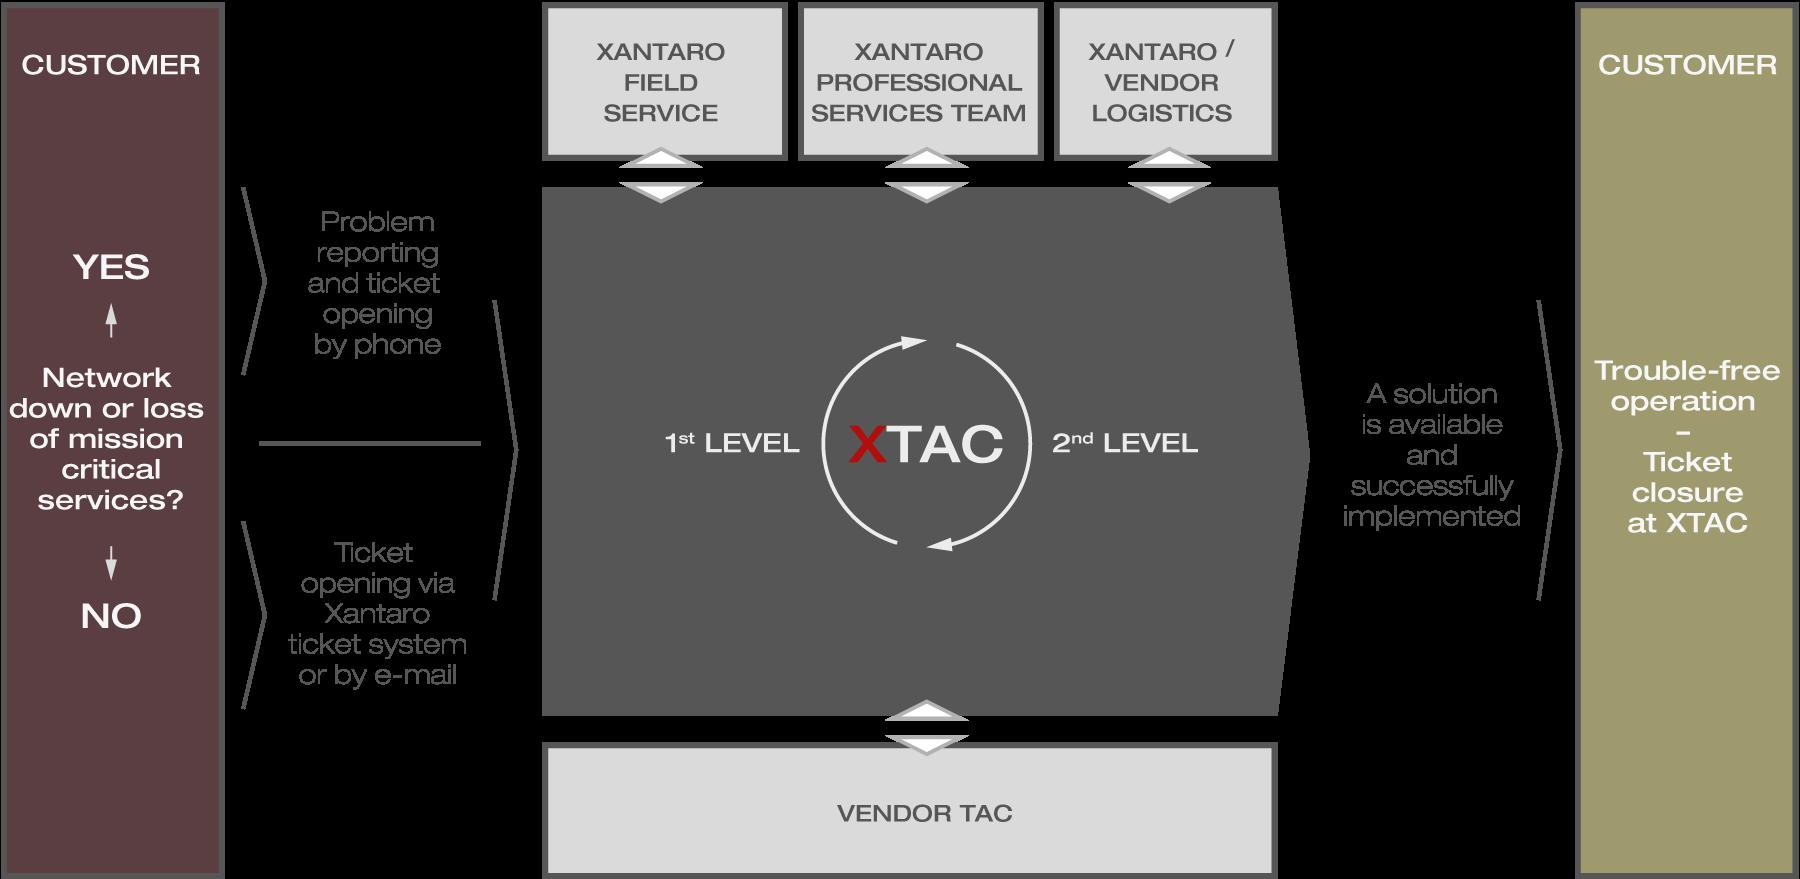 XTAC-Workflow_Xantaro